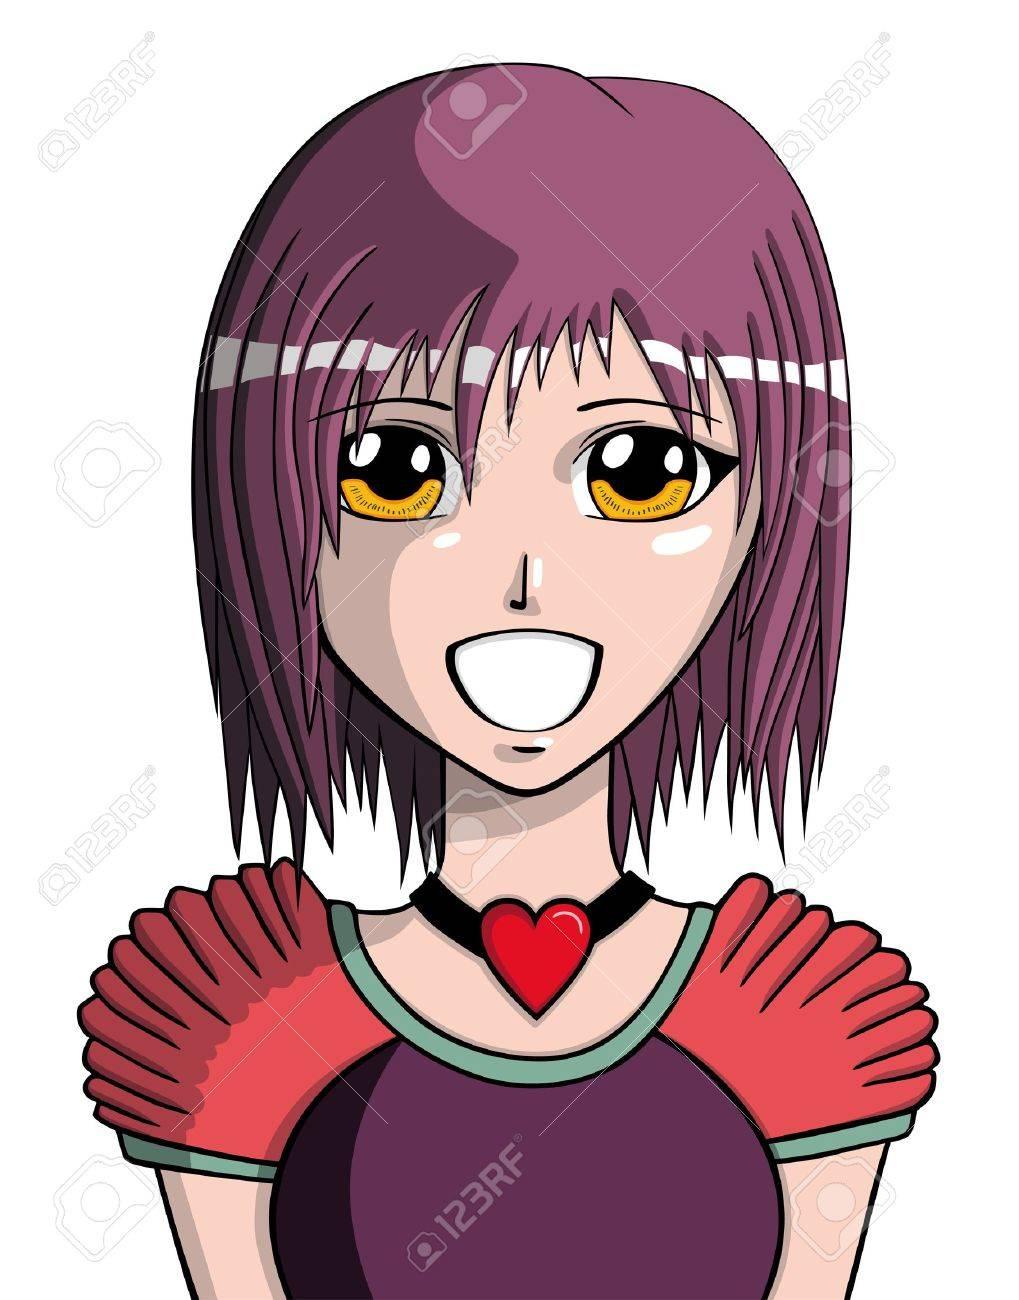 Young manga girl, vector illustration Stock Vector - 11854636